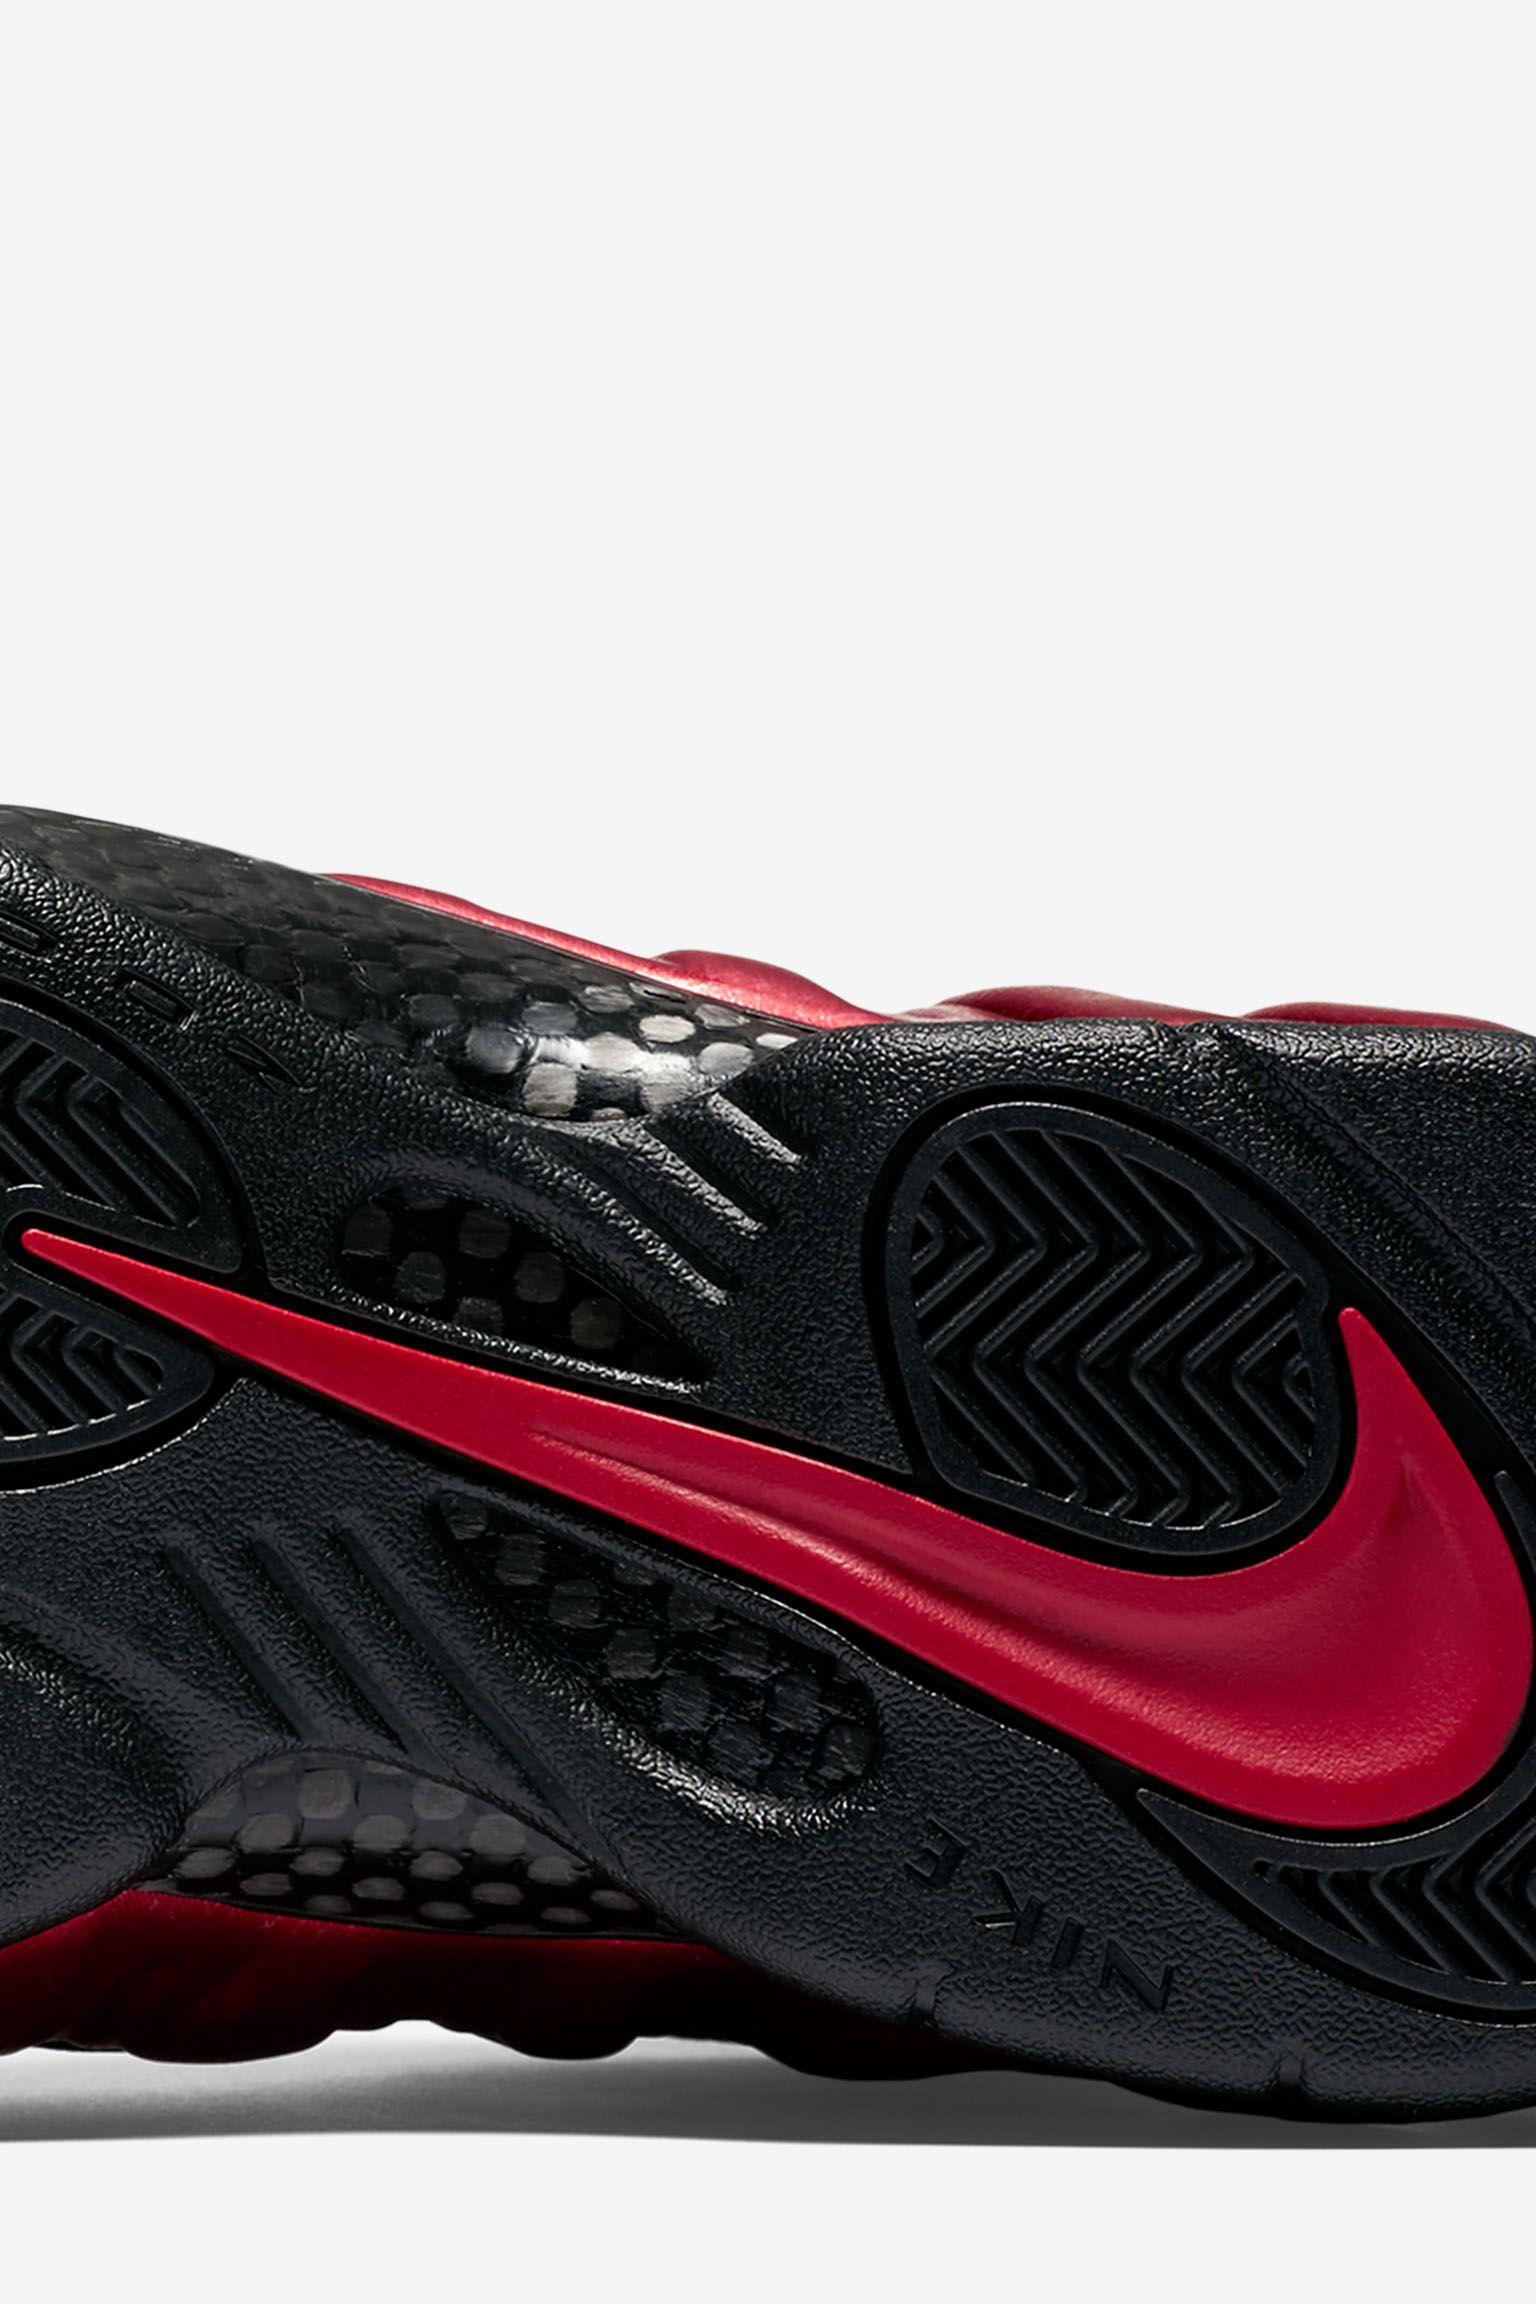 Nike Air Foamposite Pro 'University Red' Release Date